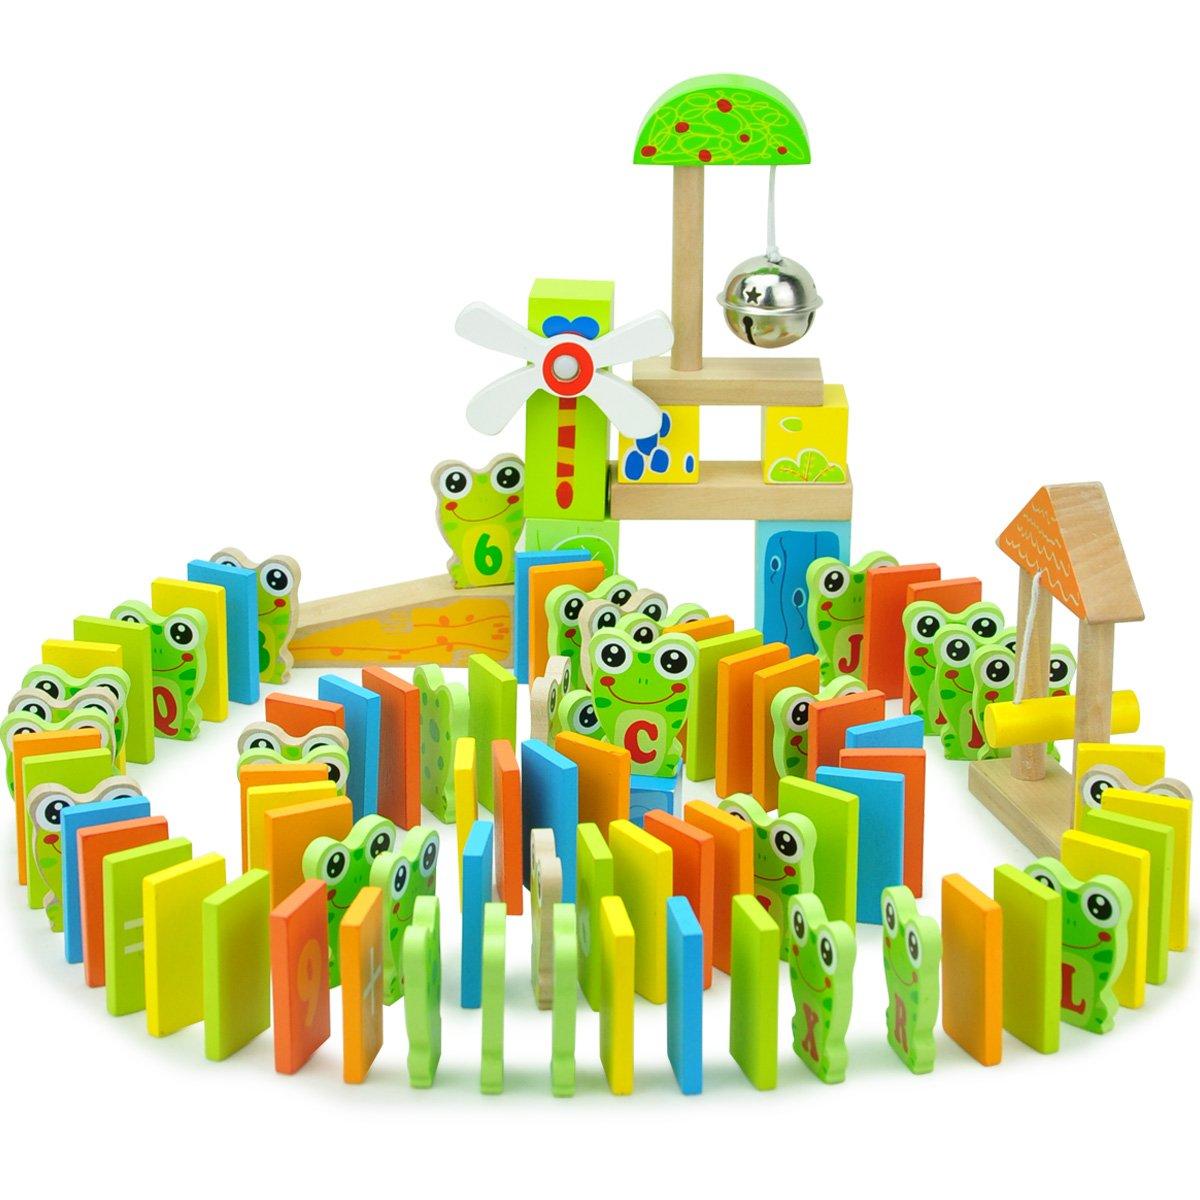 Andreu Toys TB15400 100 Pcs Wooden Frog Domino, Multi Colour, 19 x 18 cm